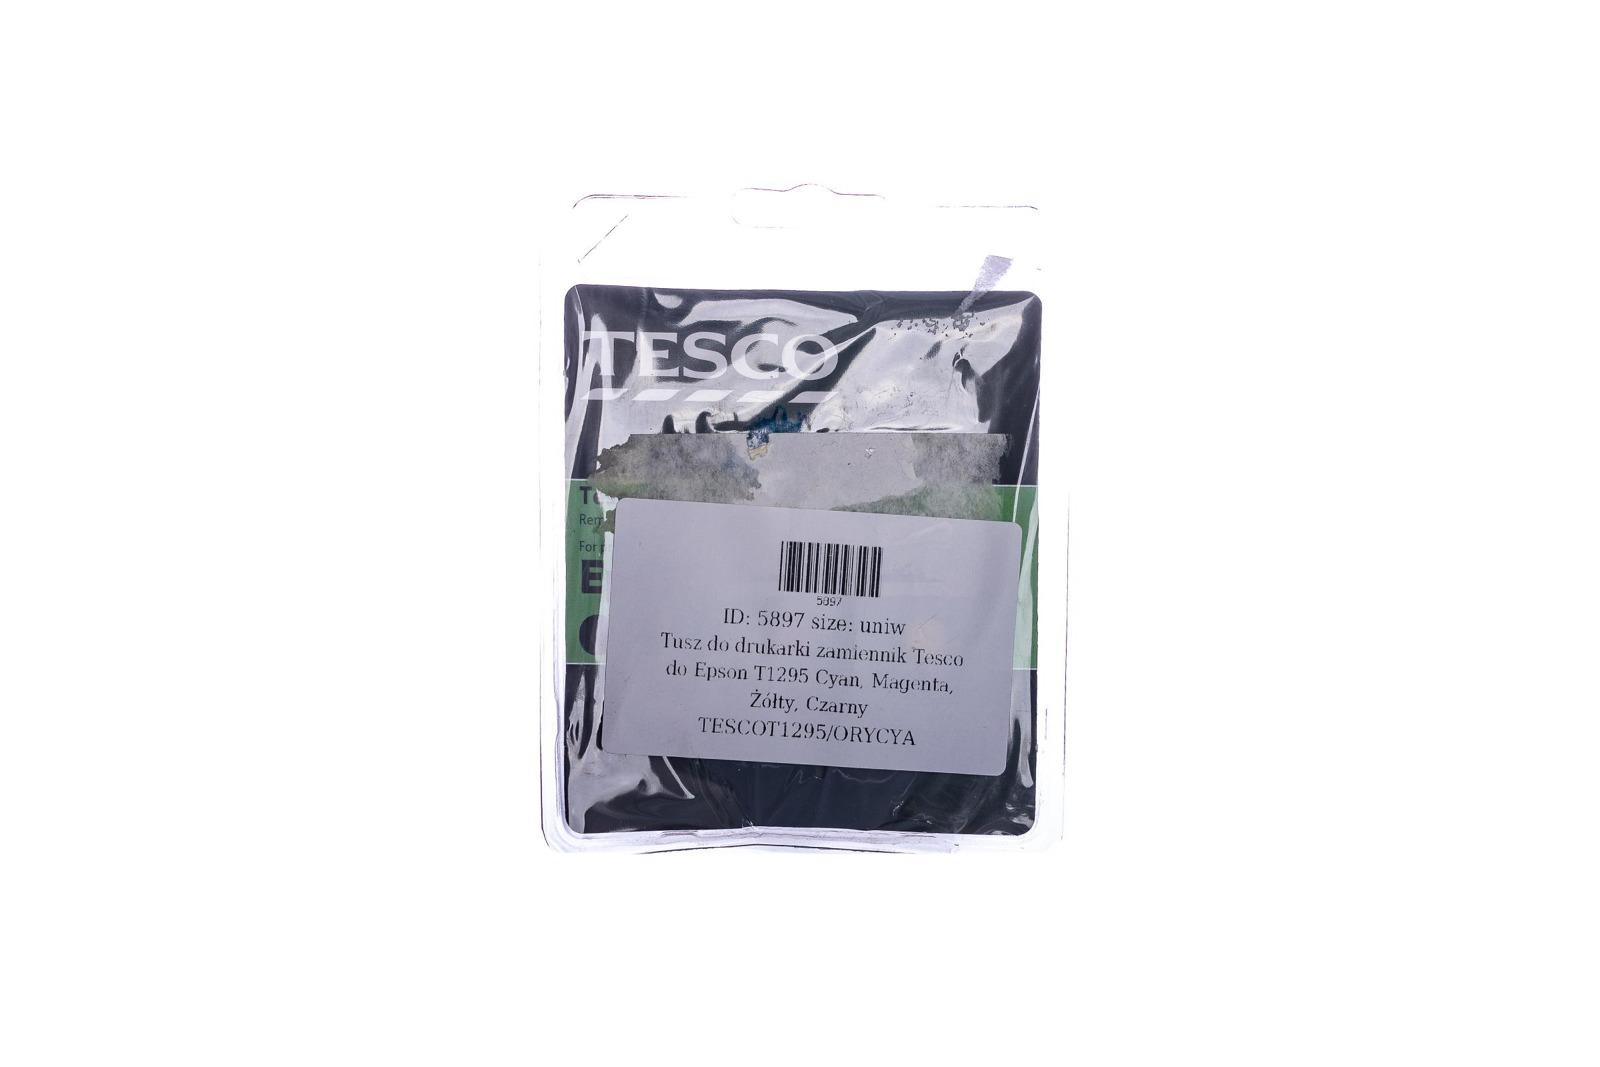 Remanufactured Ink cartridge Tesco Epson T1295 Cyan, Magenta, Yellow, Black